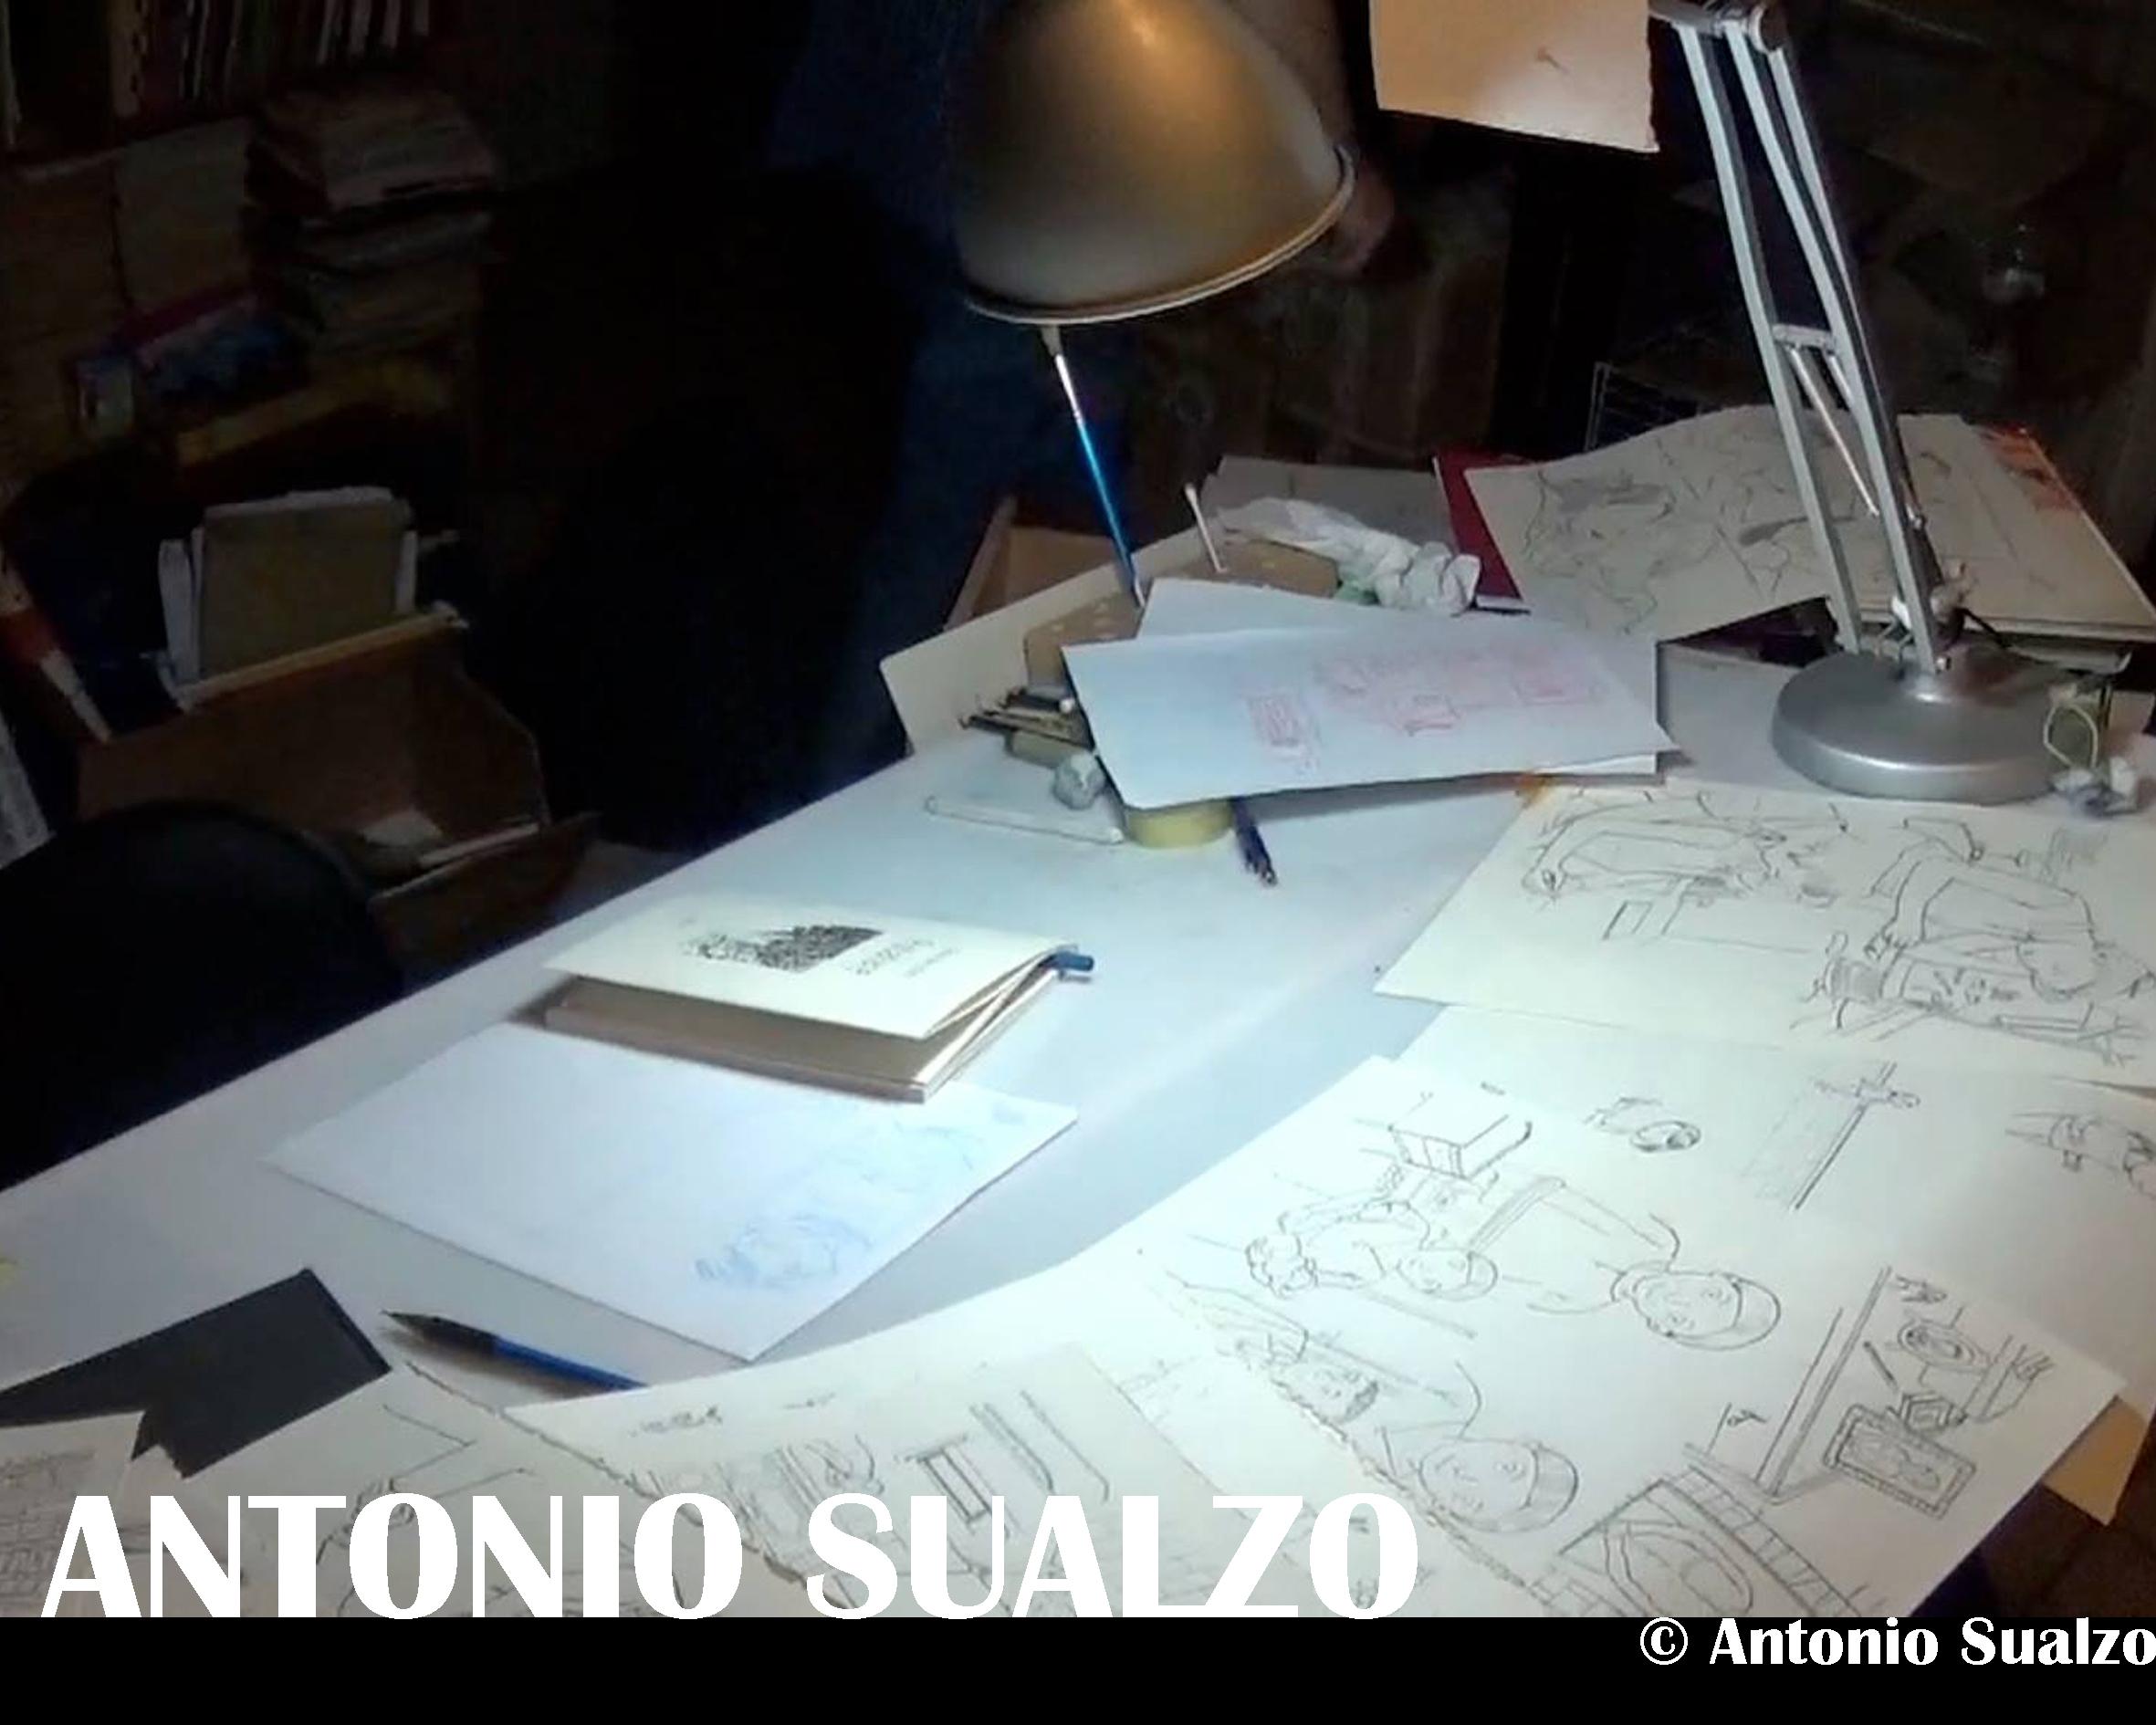 Antonio Sualzo